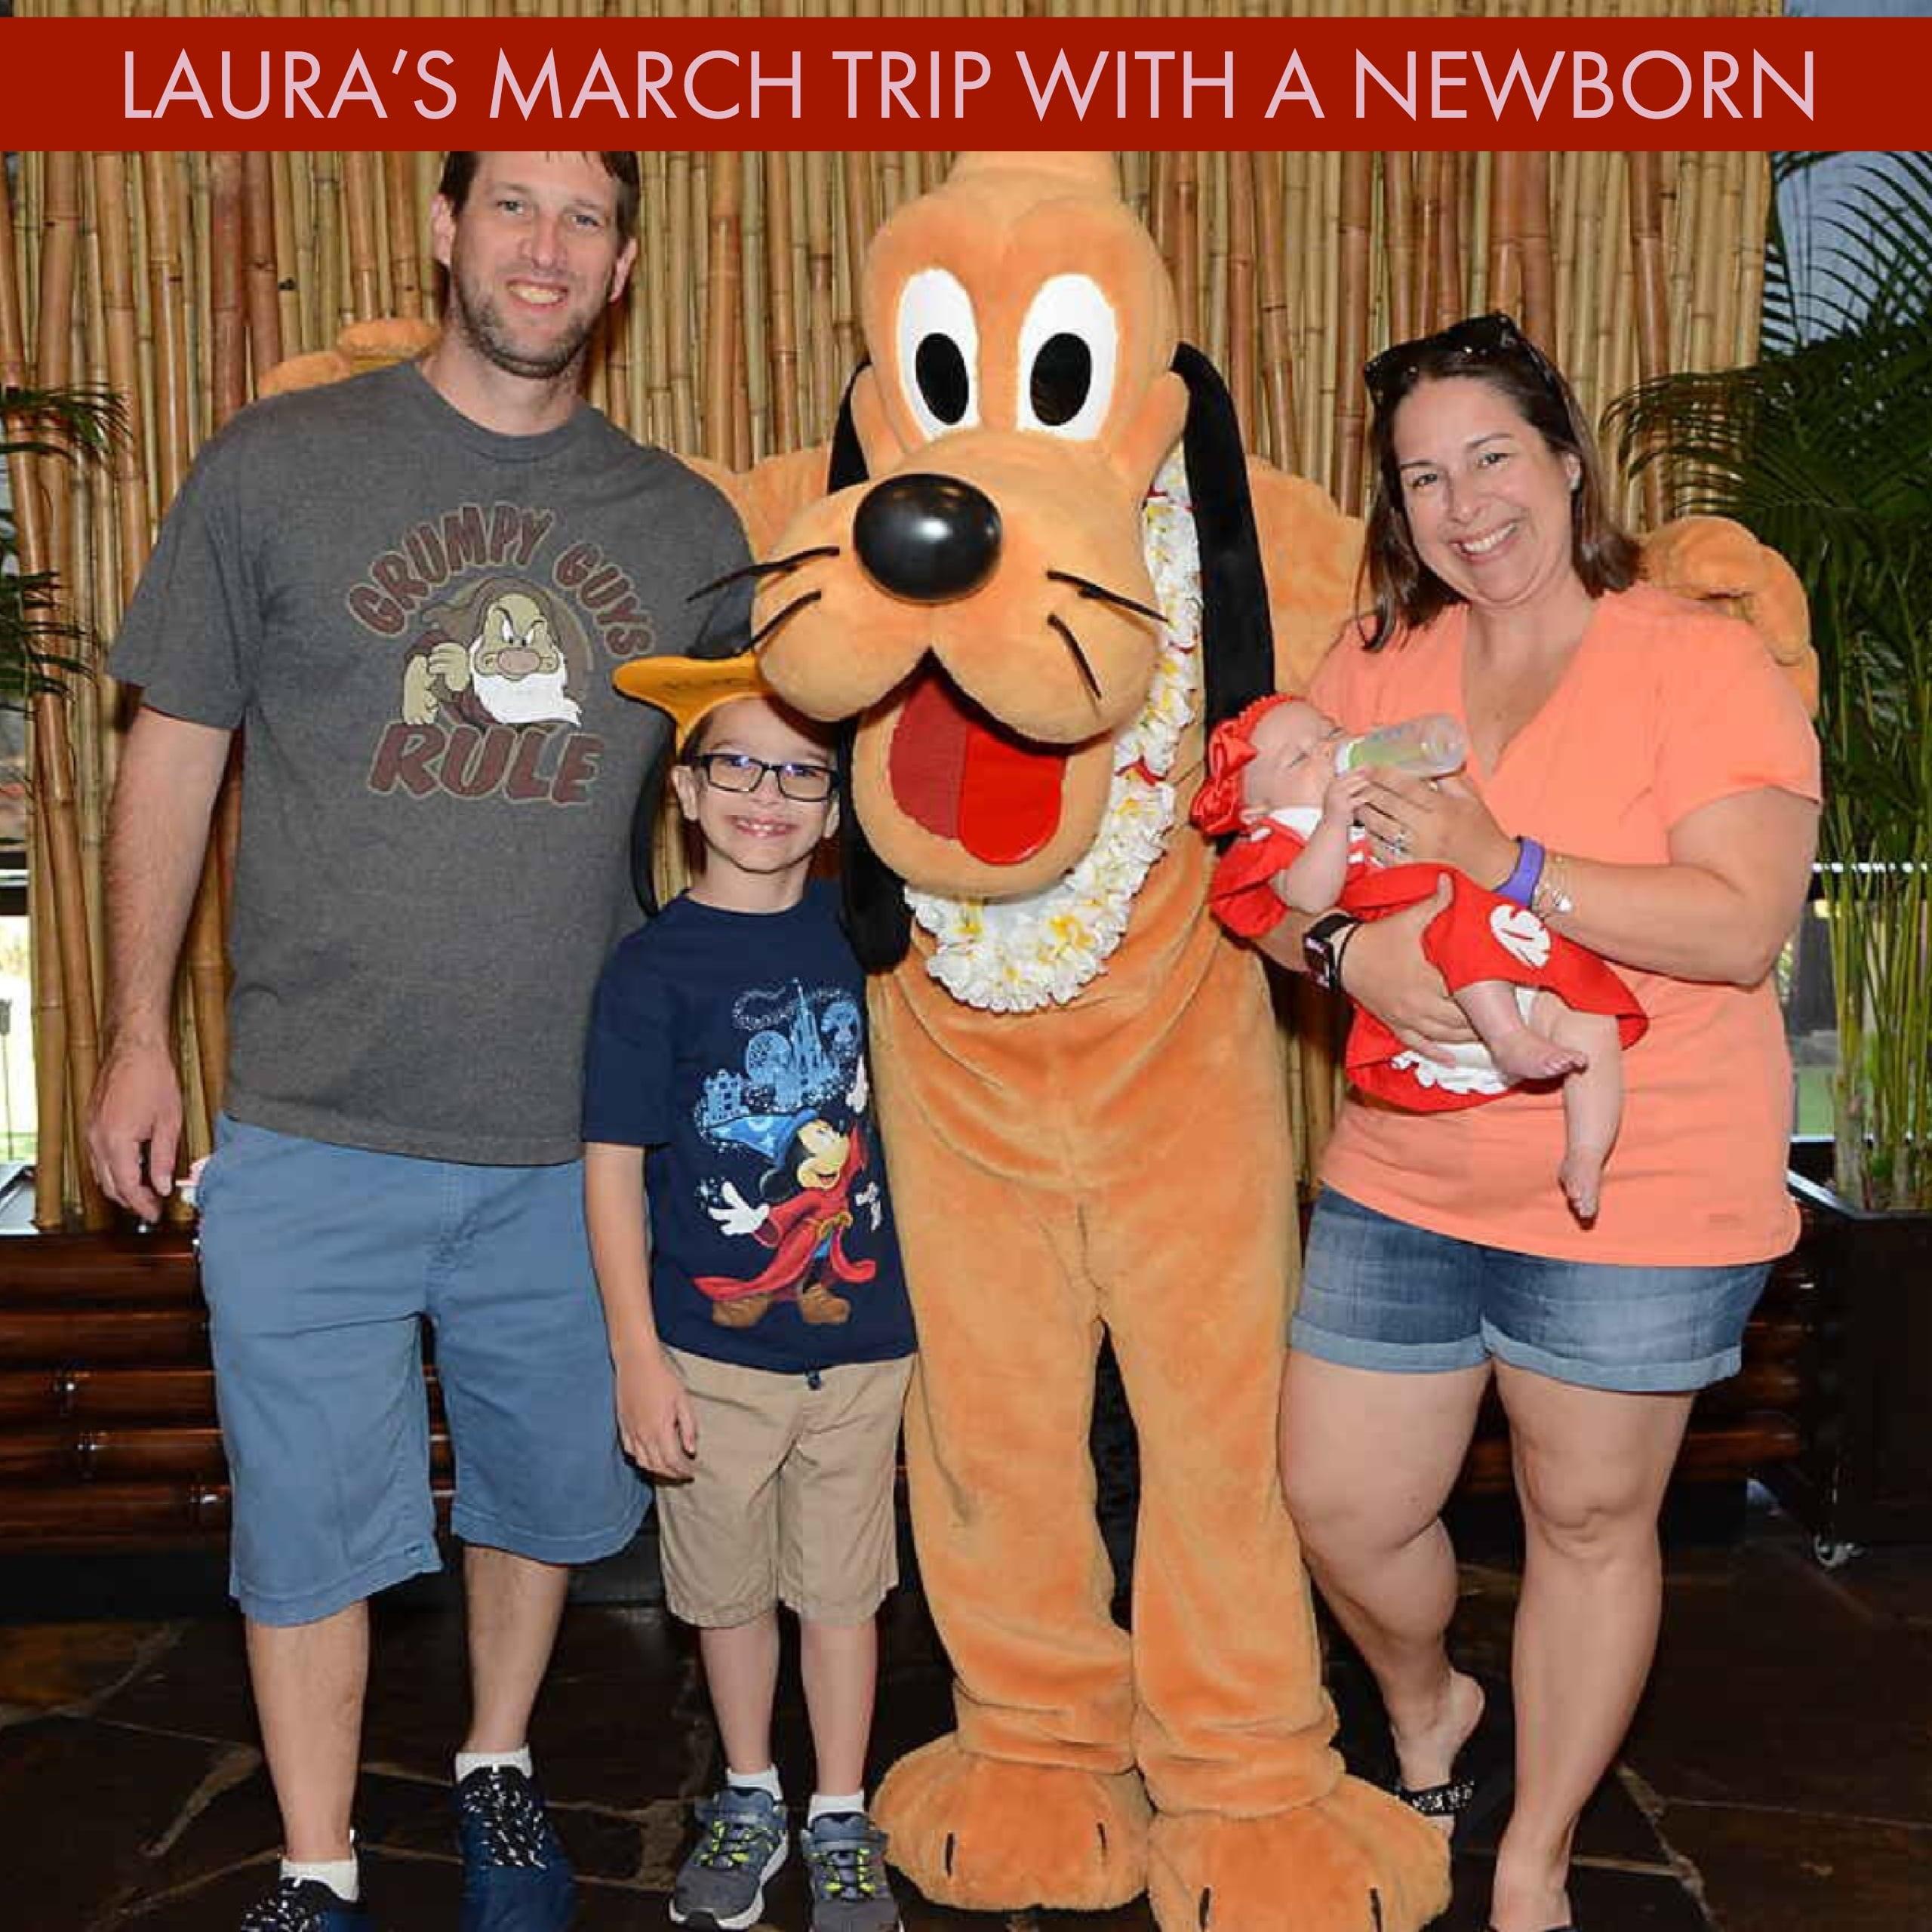 Laura's Disney World trip with a newborn